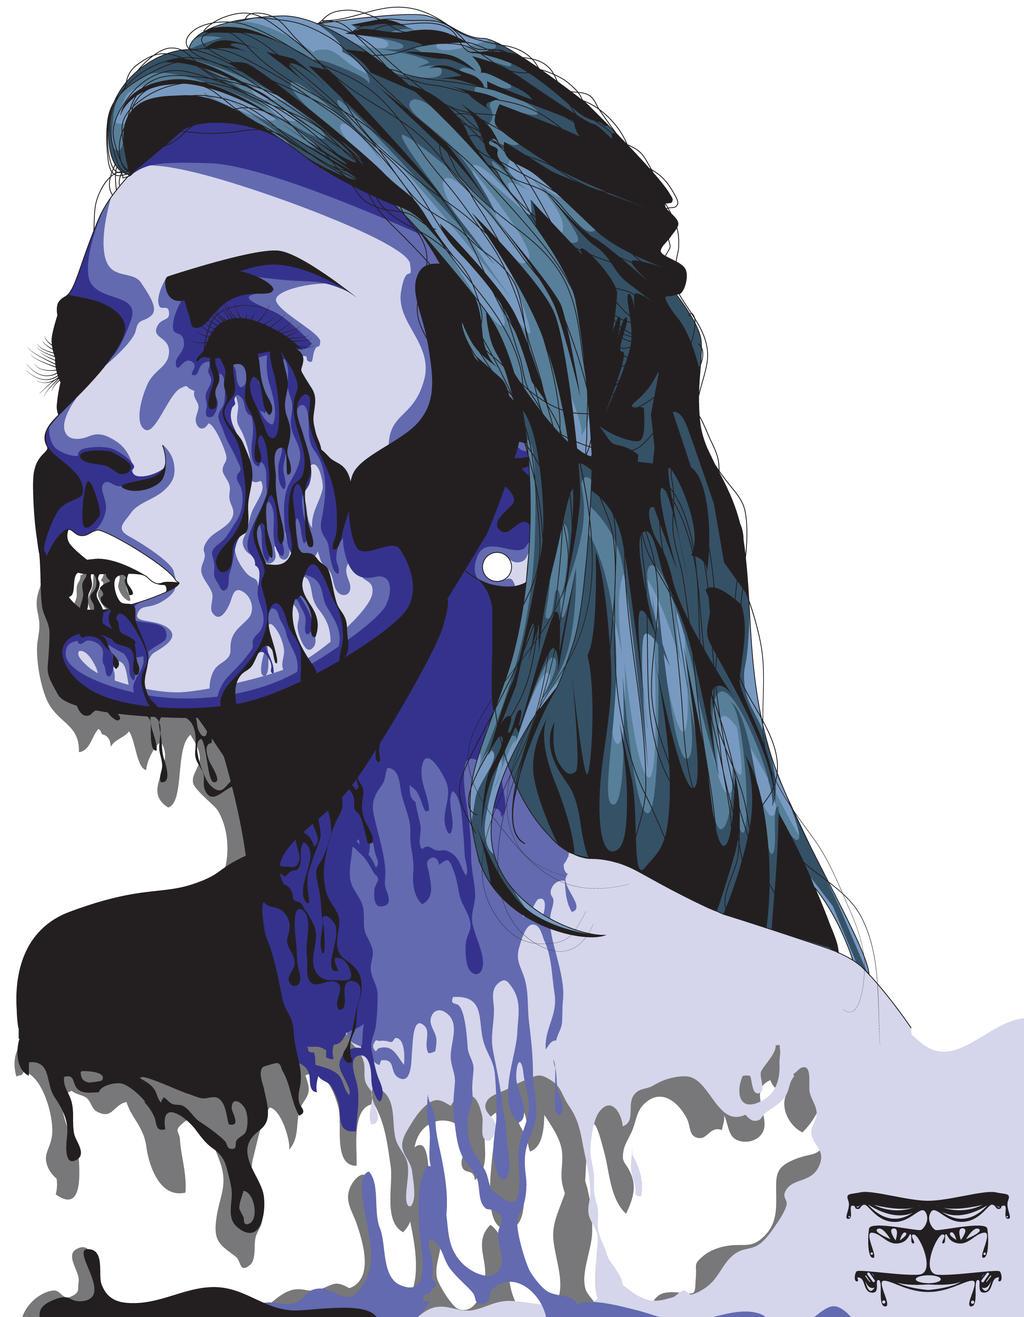 View My Lies by phantomonex